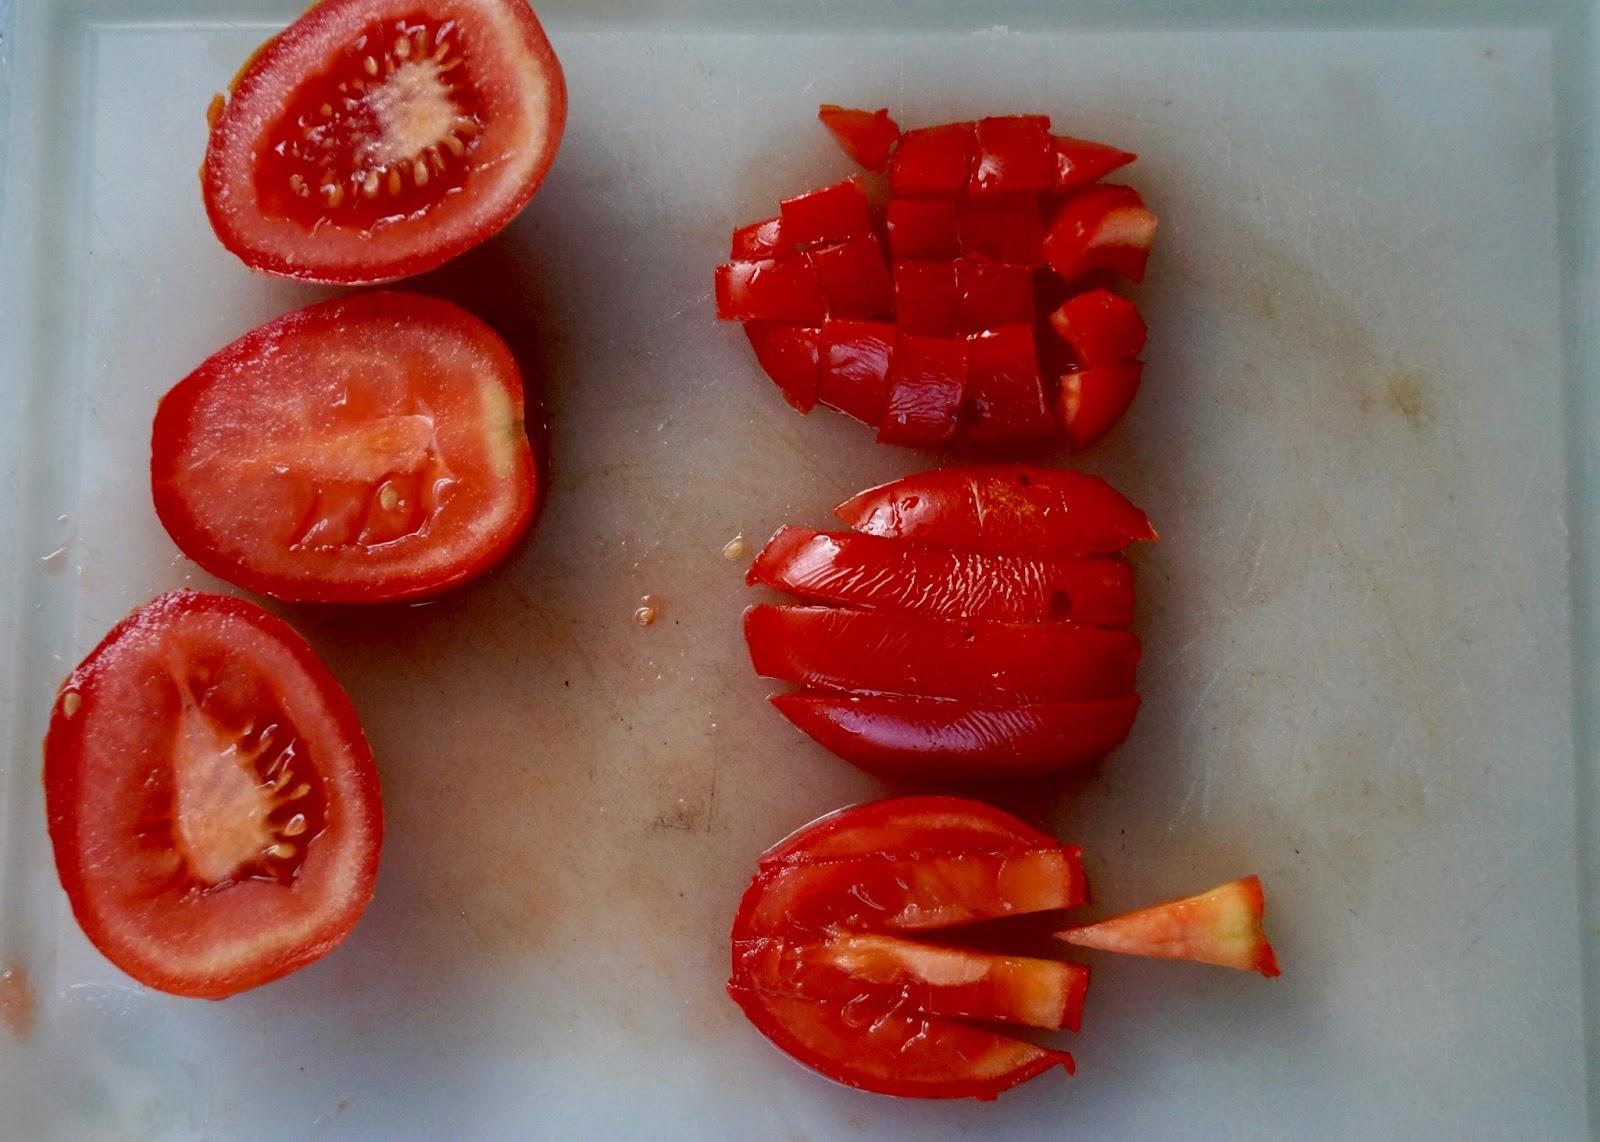 Tartare de tomates au basilic - Comment couper le basilic ...